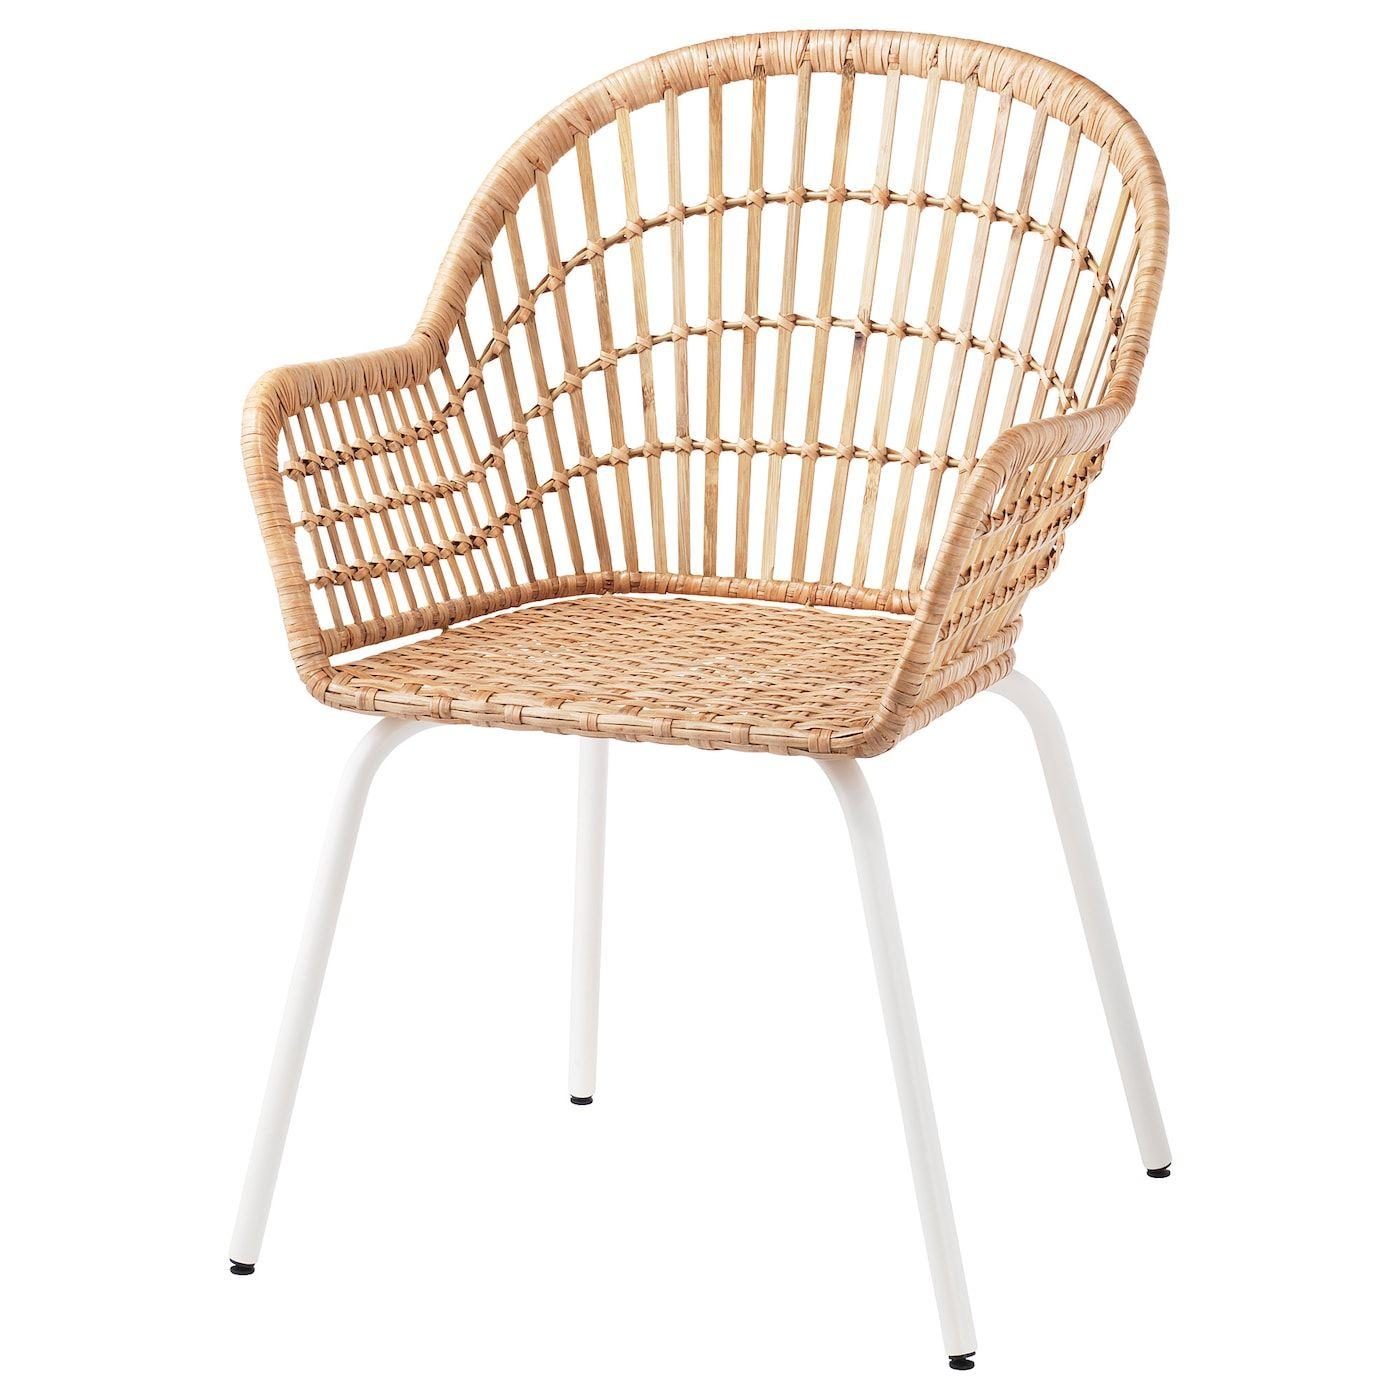 Nilsove Armchair Rattan White Ikea In 2020 Ikea Chair